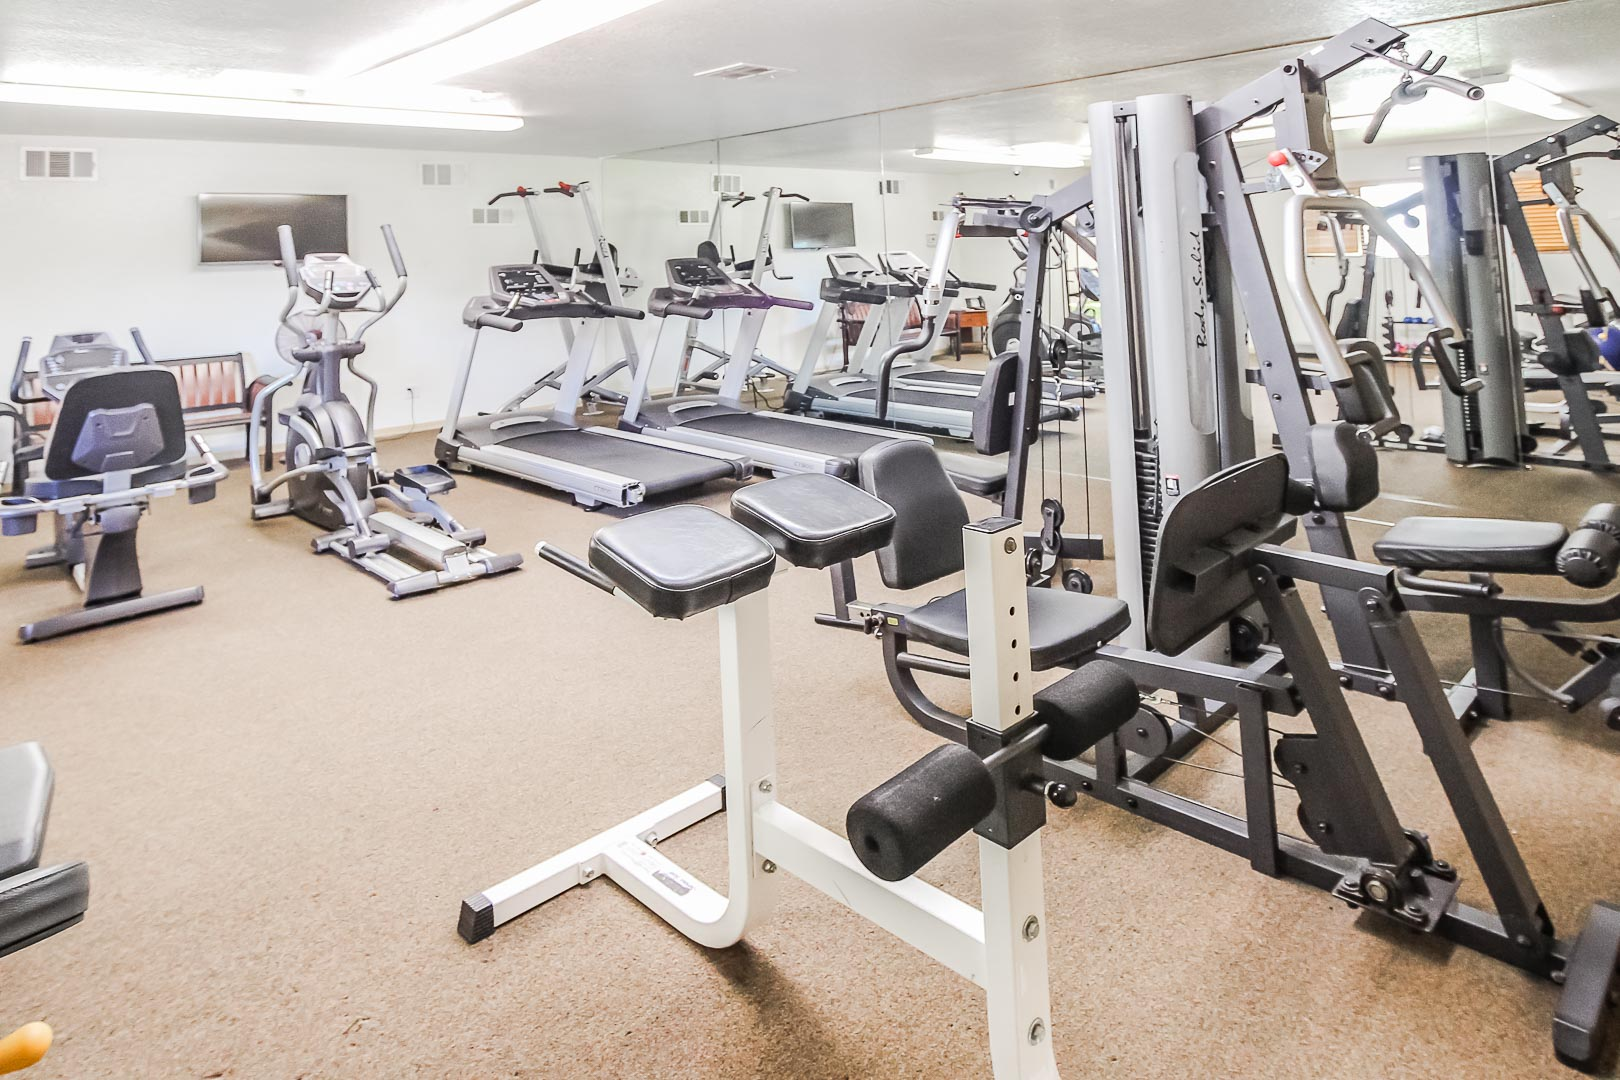 Fully equipped exercise room at VRI's Desert Isle Resort in California.